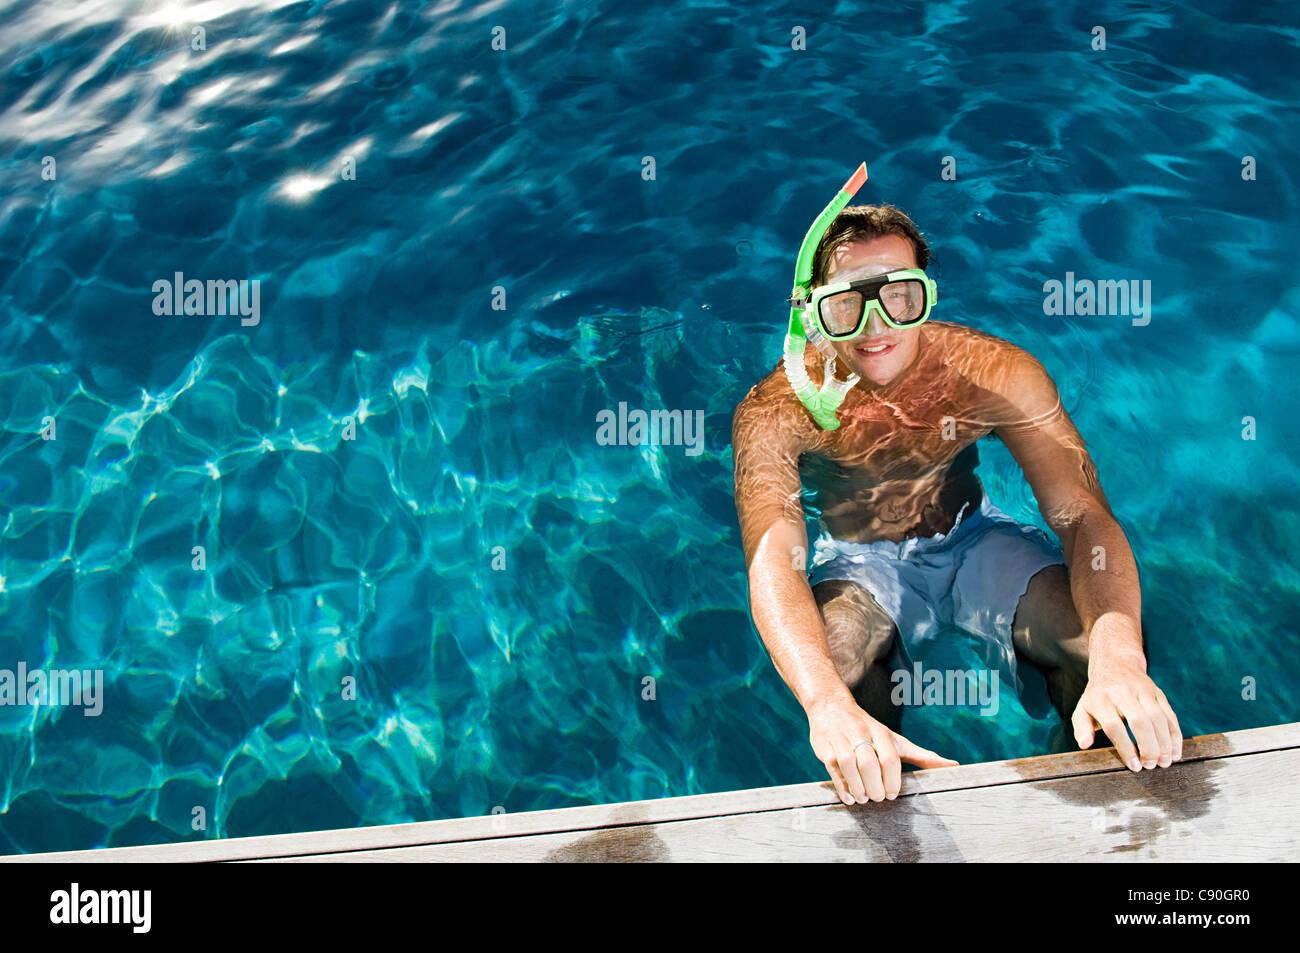 Jeune homme portant tuba au bord de la piscine, high angle Photo Stock